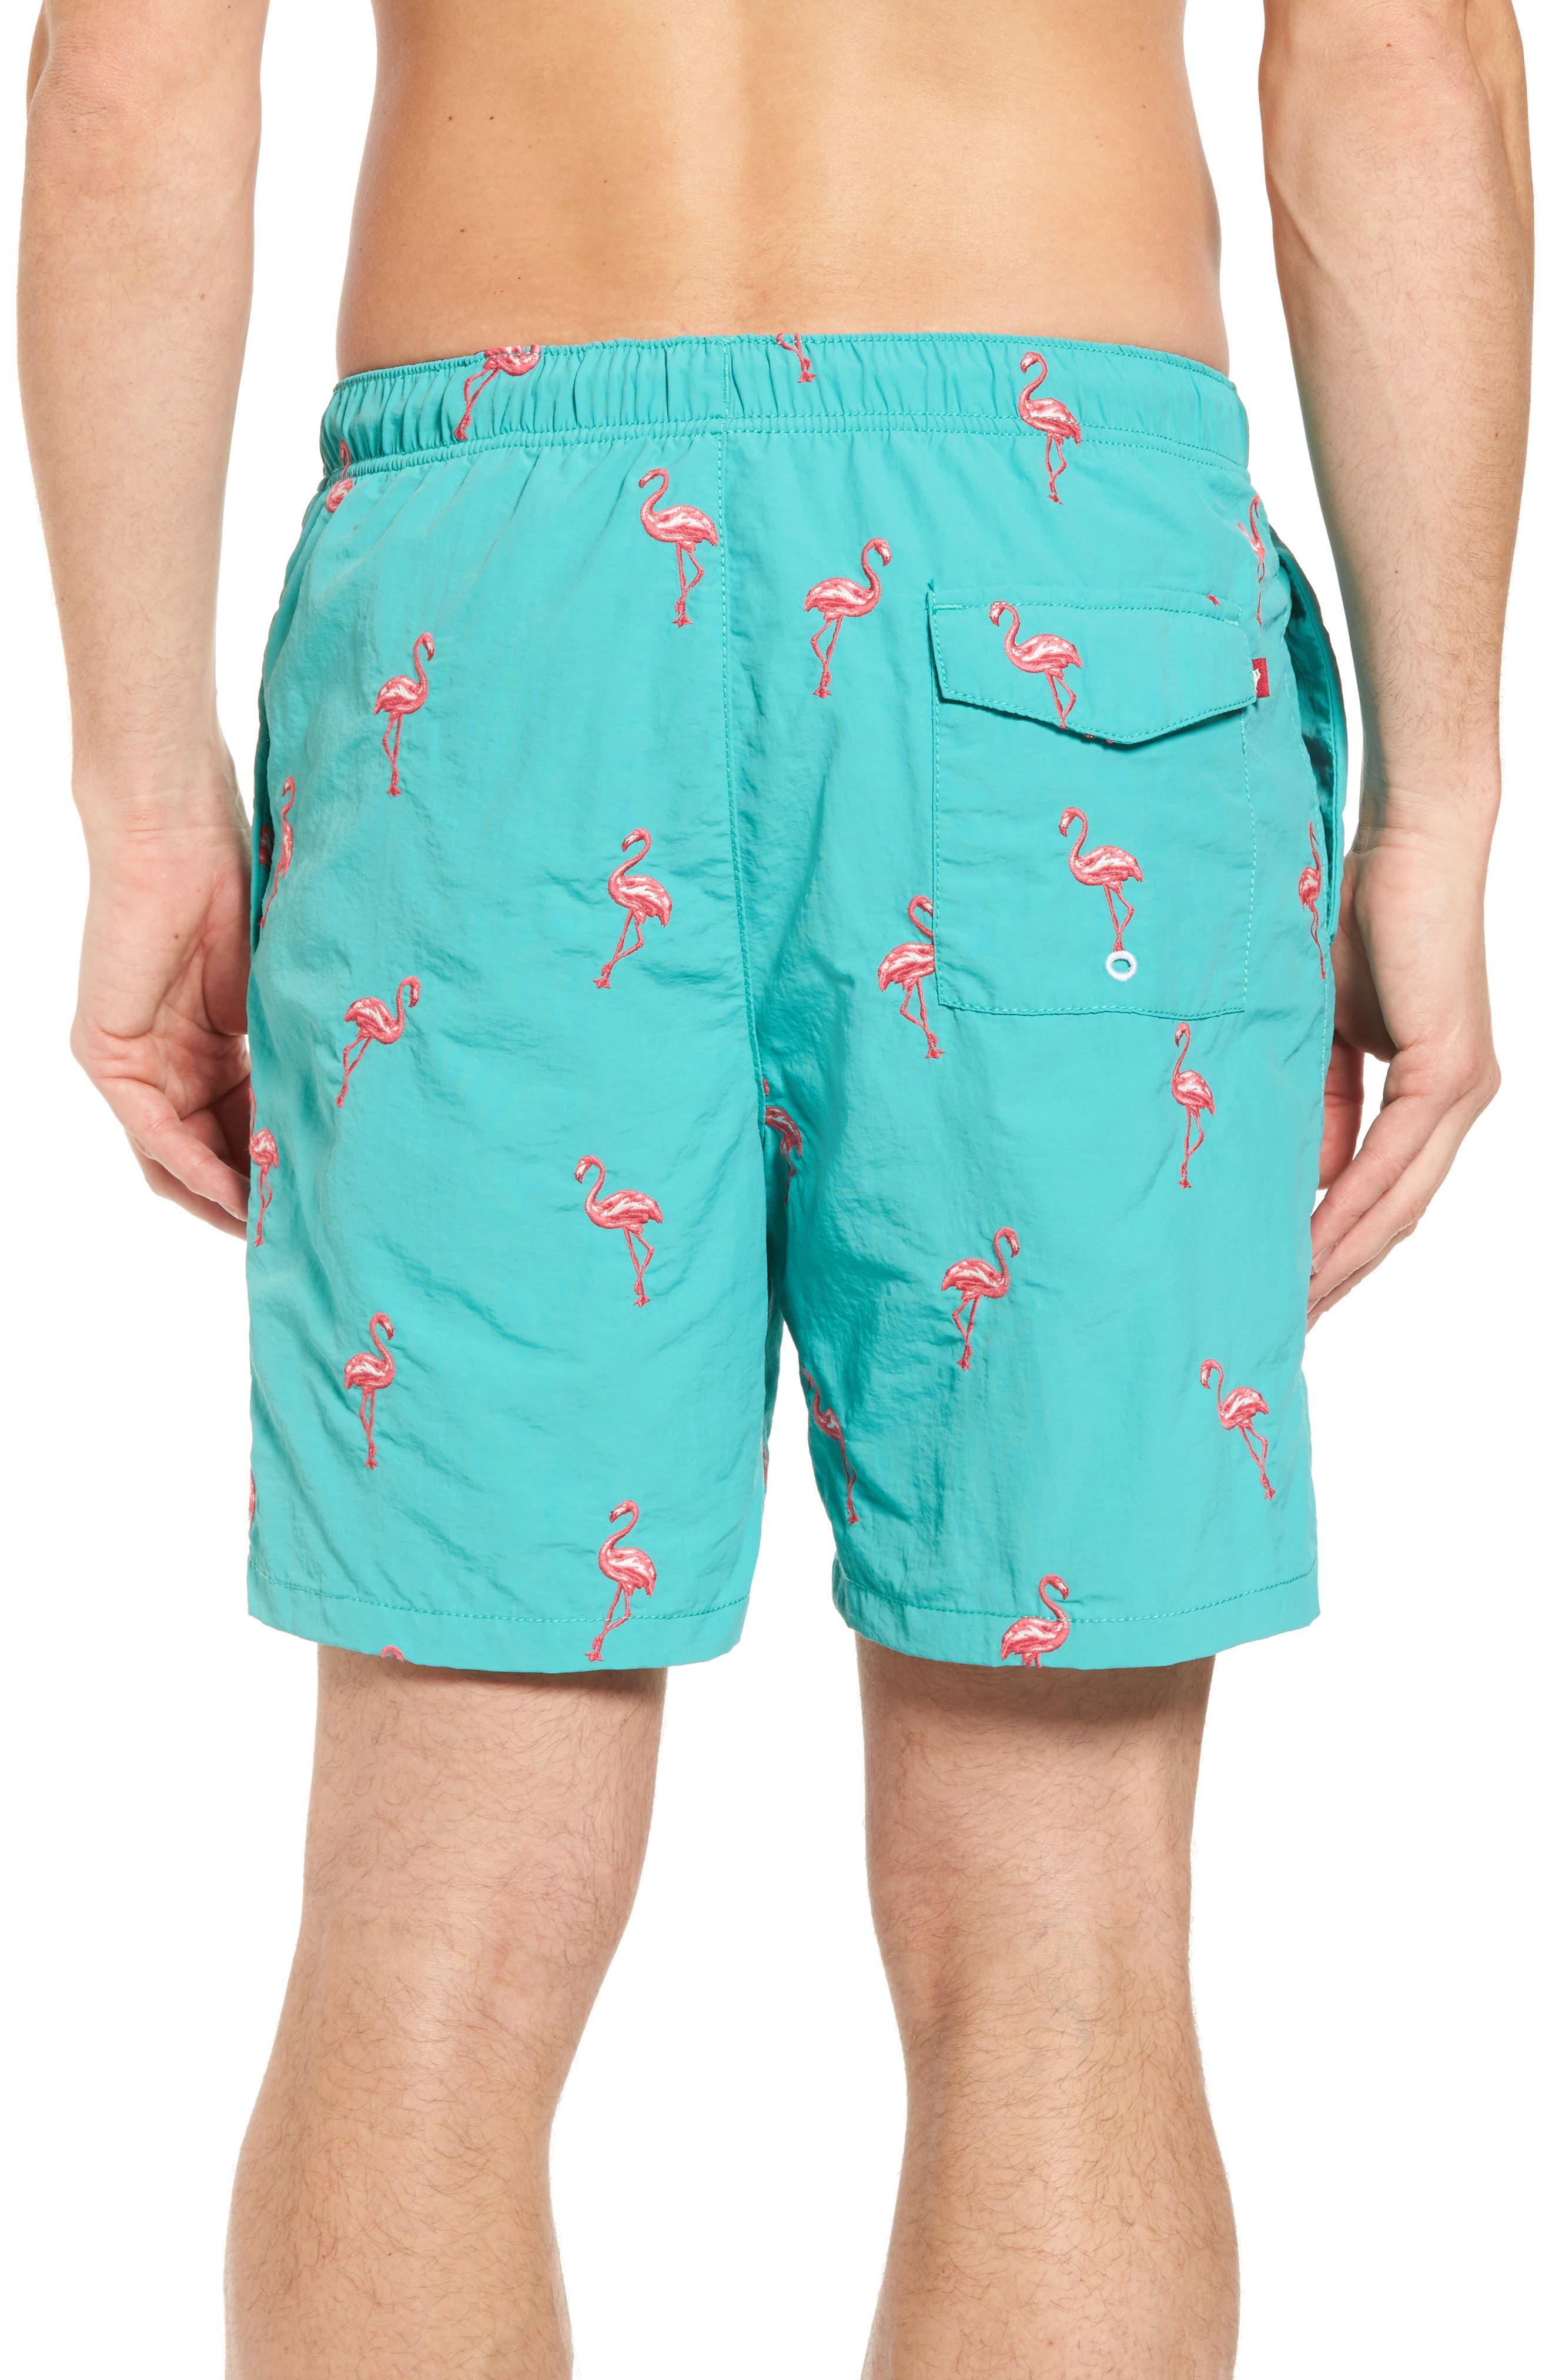 Naples Flamingo Coast Swim Trunks,                             Alternate thumbnail 2, color,                             CASTAWAY GREEN